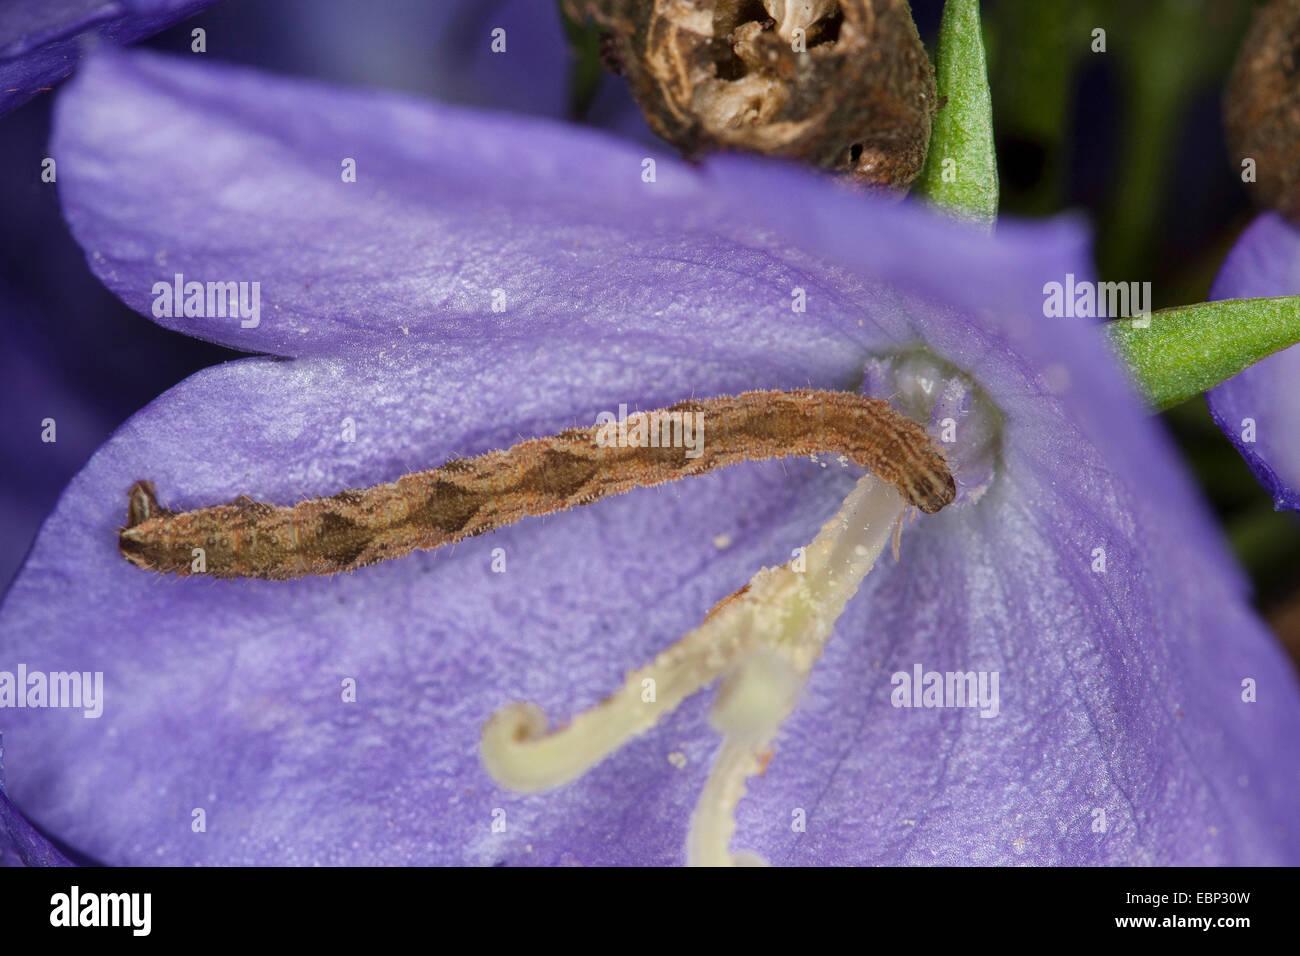 Wormwood Pug, pugs (Eupithecia cf. absinthiata, Phalaena cf. absinthiata, Tephroclystia cf. absinthiata), caterpillar - Stock Image